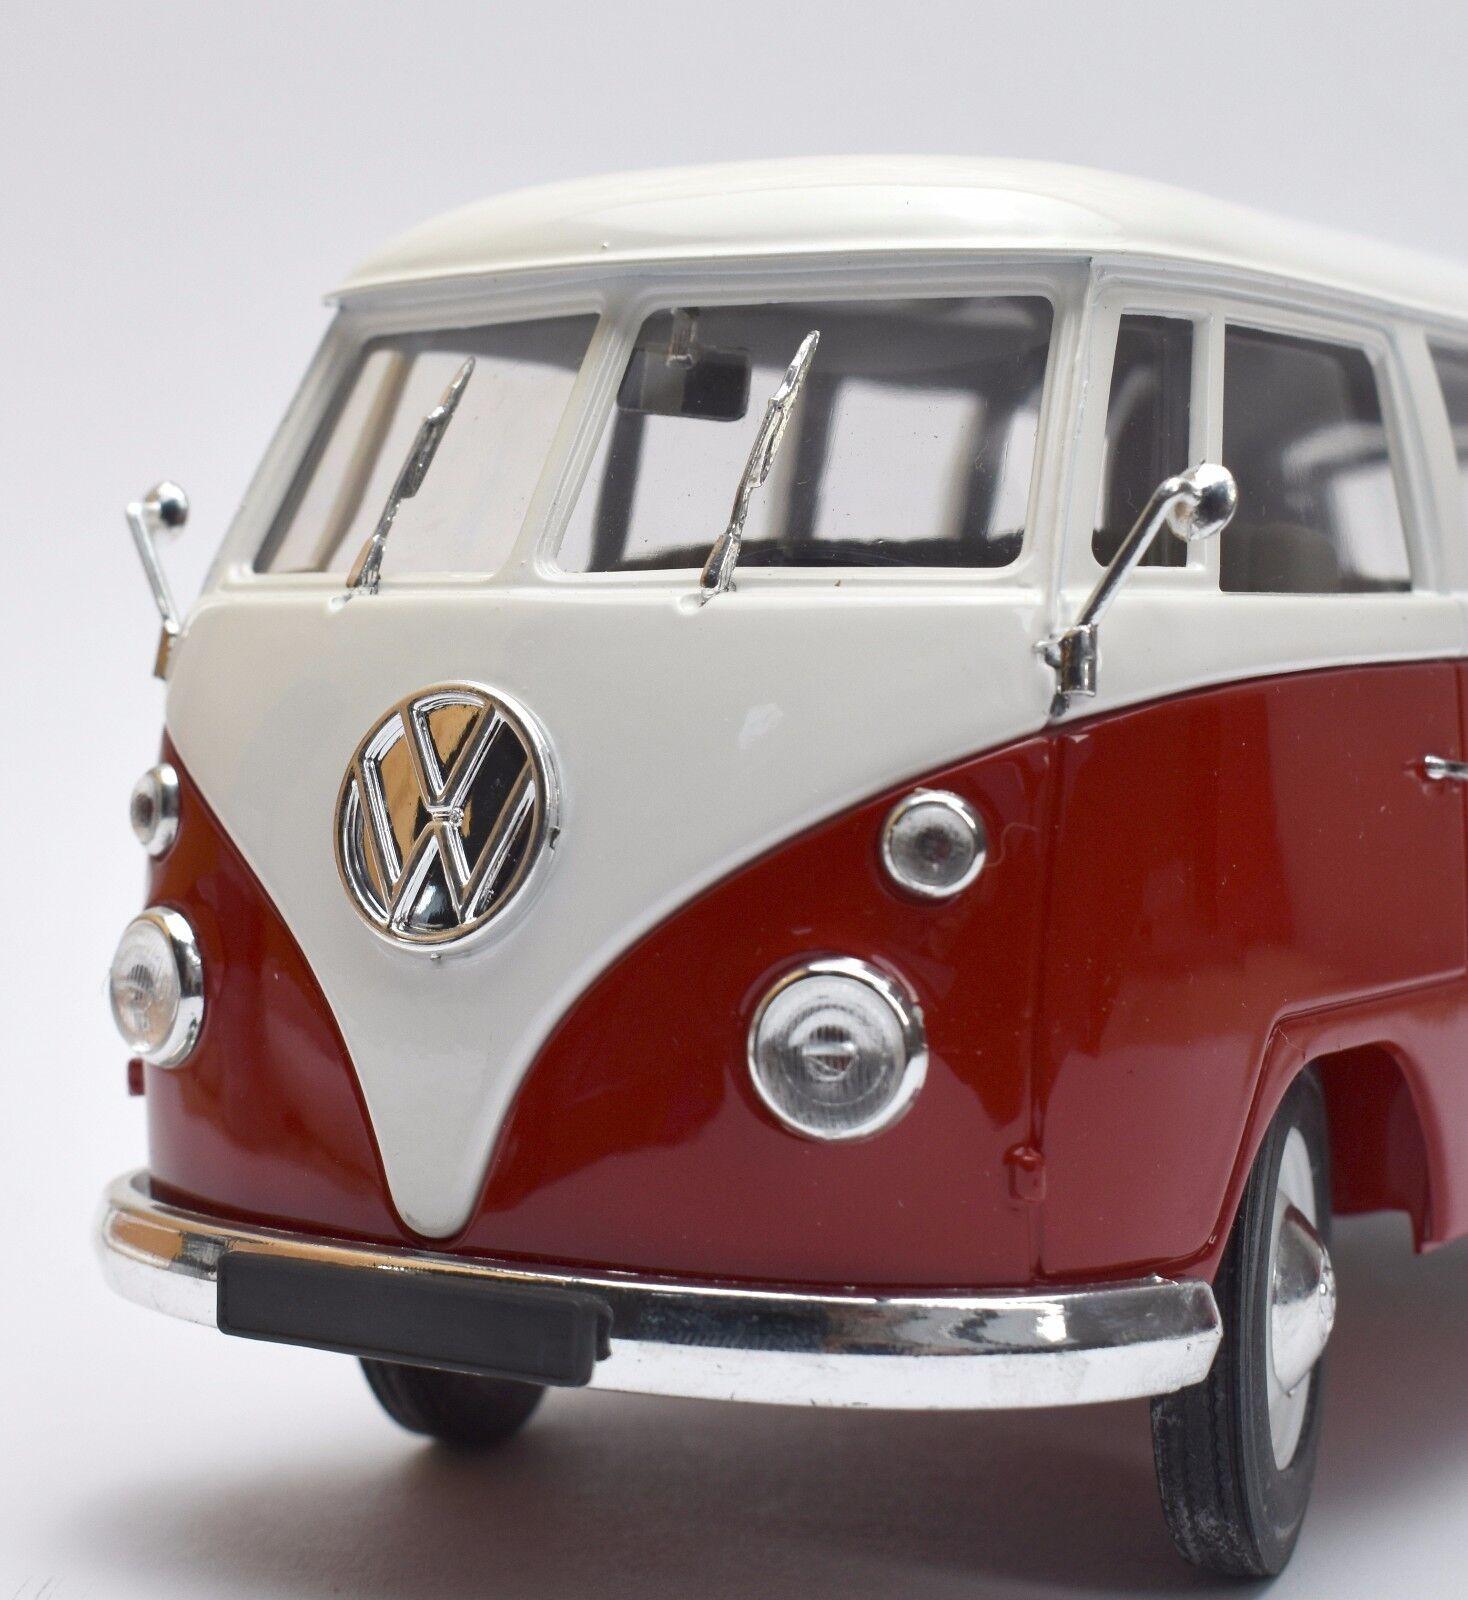 Solido Classic VW Volkswagen t1 Bulli in rouge Painted  blanc, OVP, 1 18, k012  bonne qualité